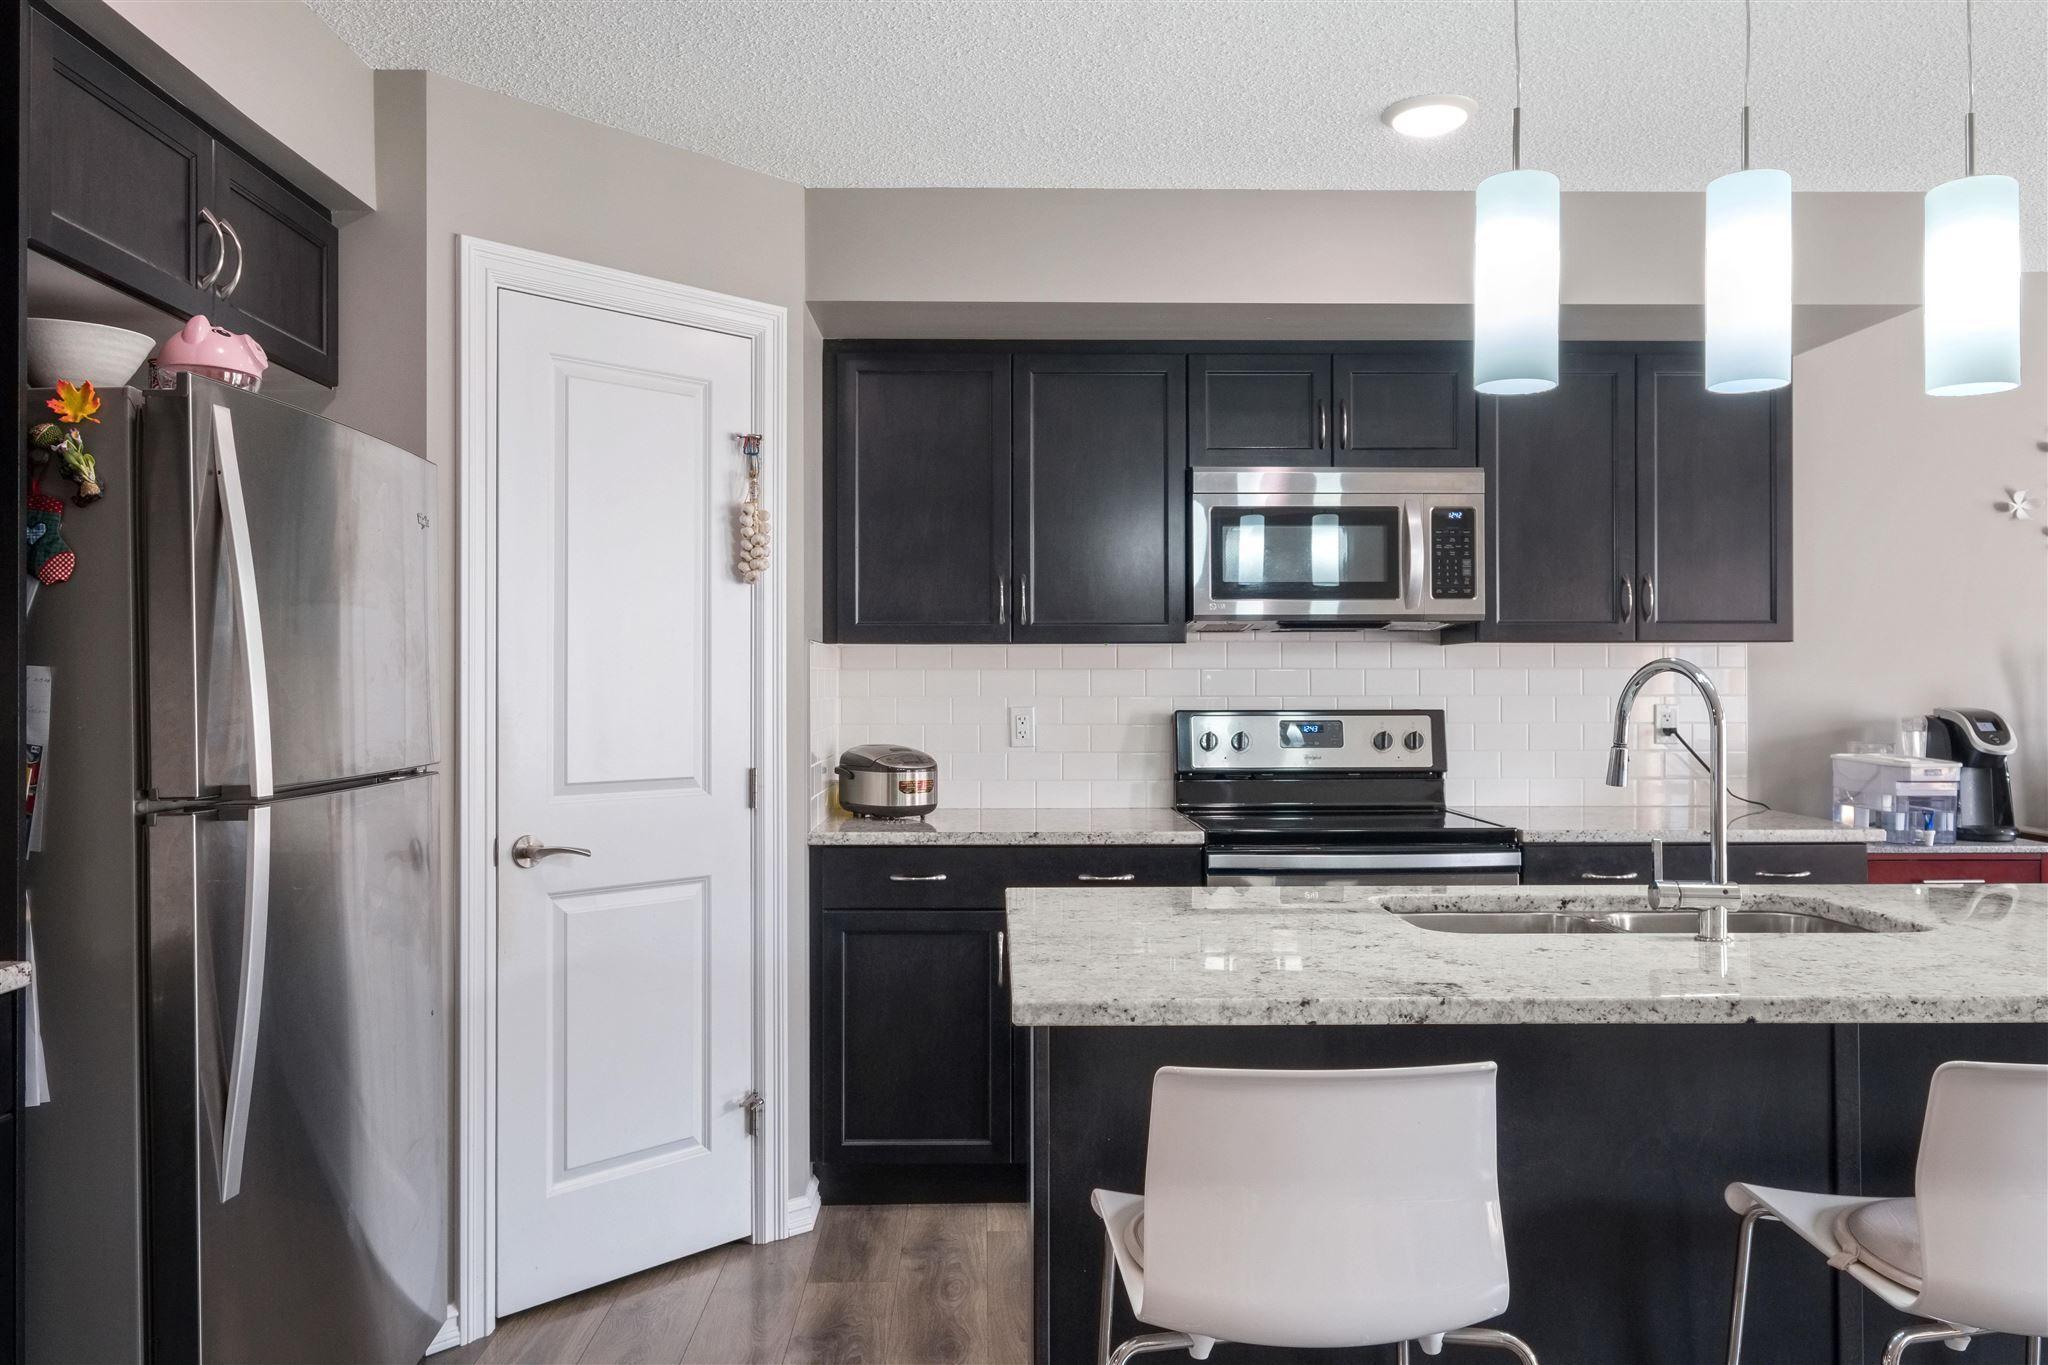 Main Photo: 4437 6A Street in Edmonton: Zone 30 House Half Duplex for sale : MLS®# E4257526